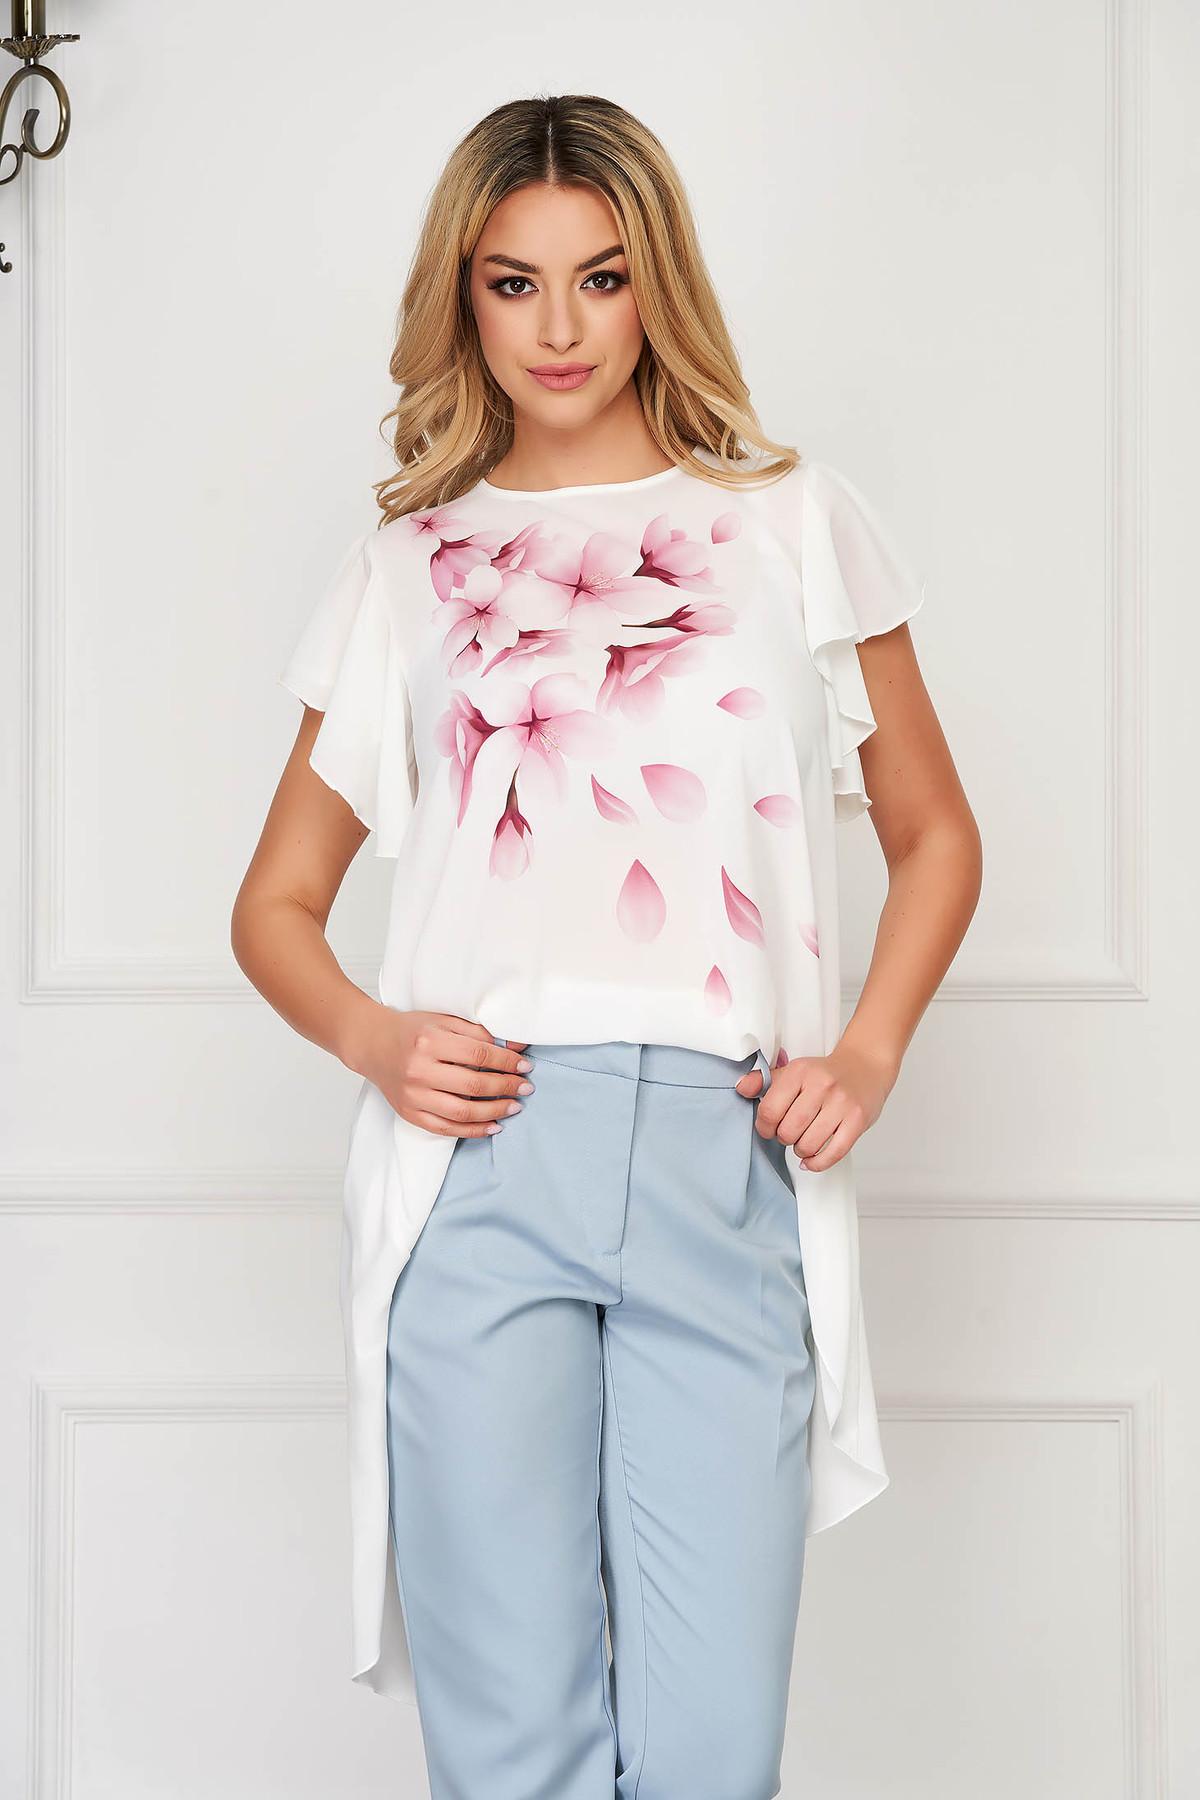 Bluza dama StarShinerS alba eleganta asimetrica din muszlin cu imprimeu custom made in atelierele StarShinerS